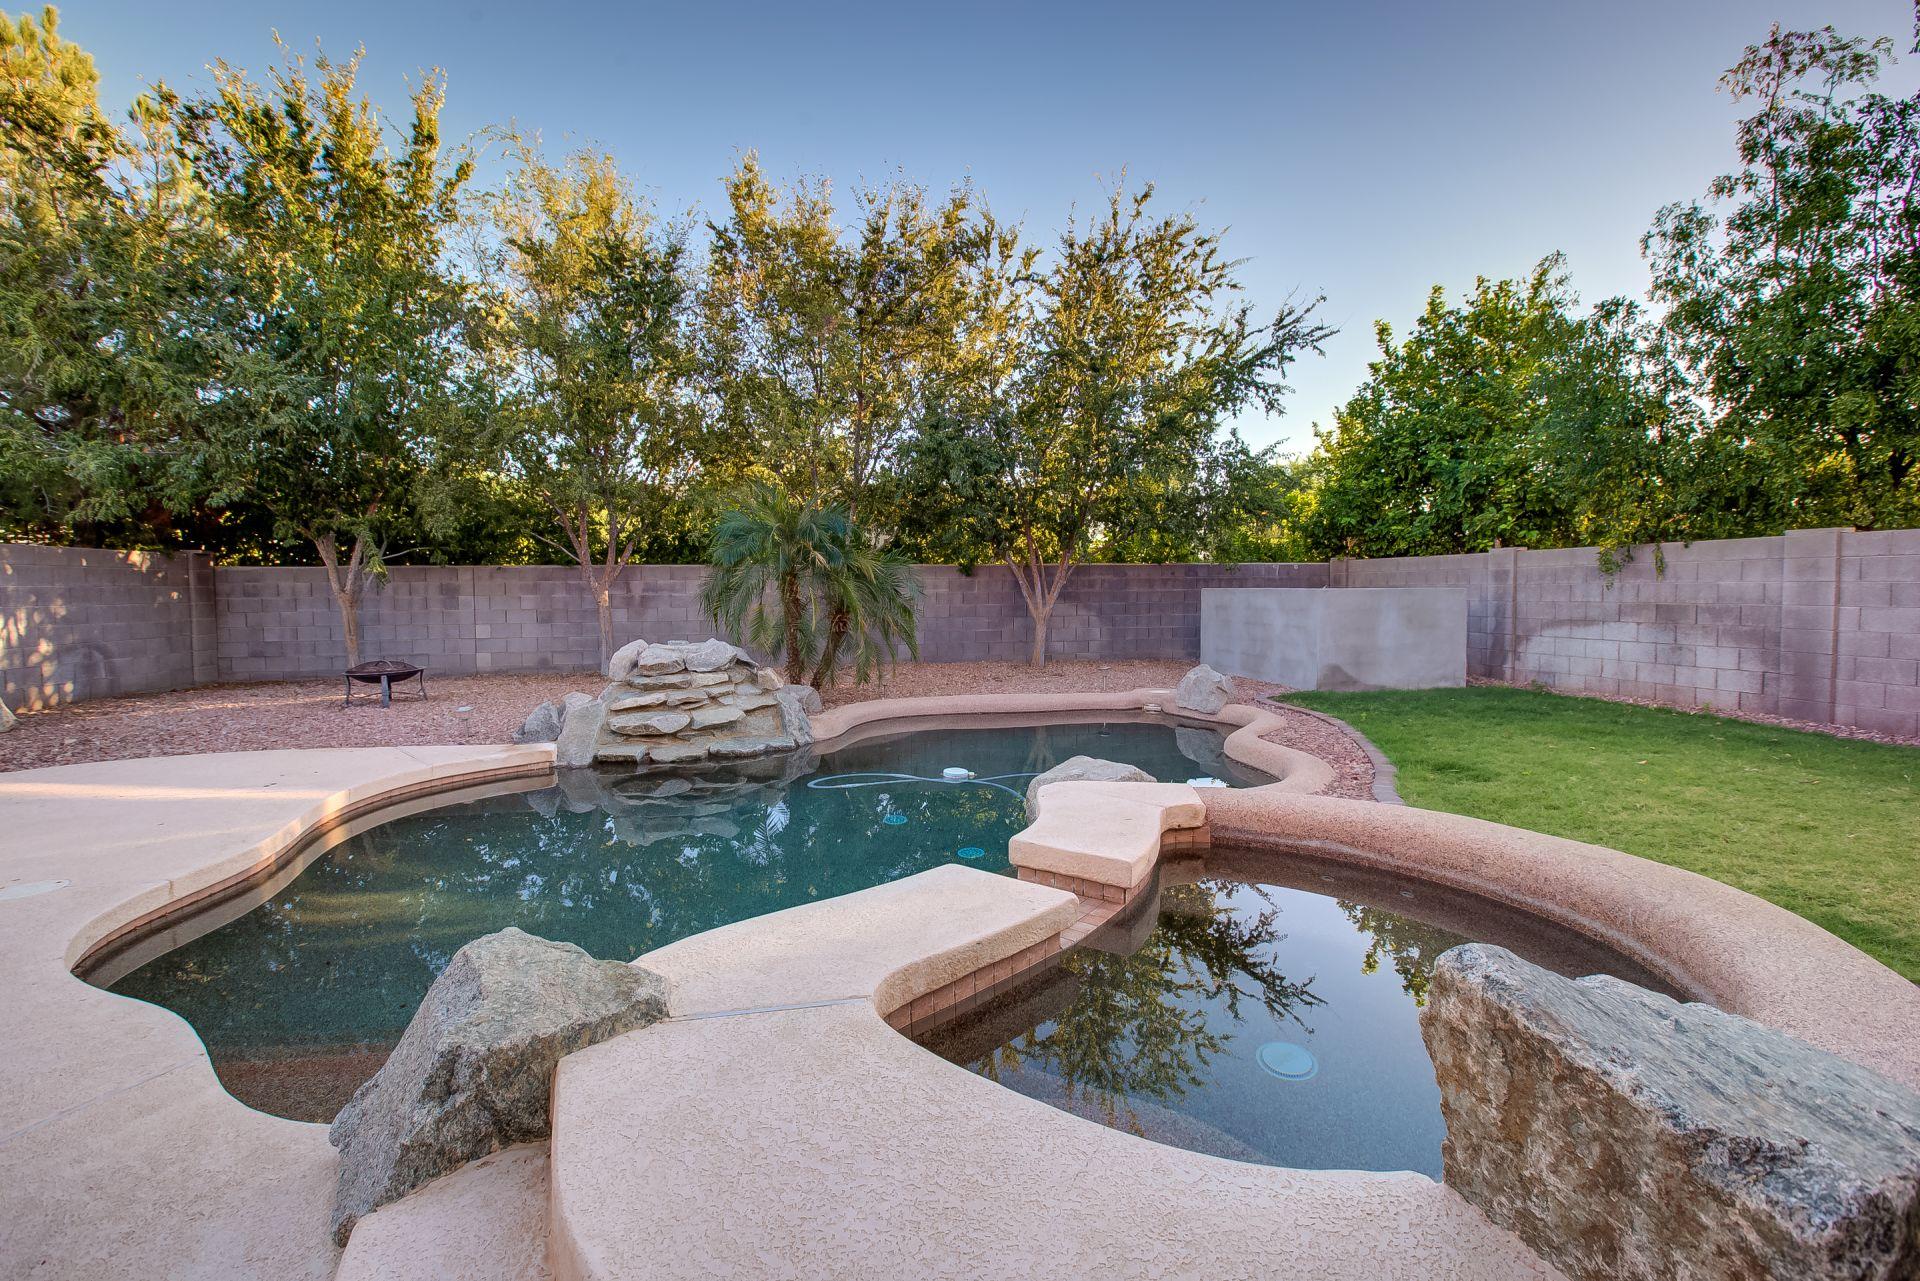 705 E IRMA LN, Phoenix, AZ 85024